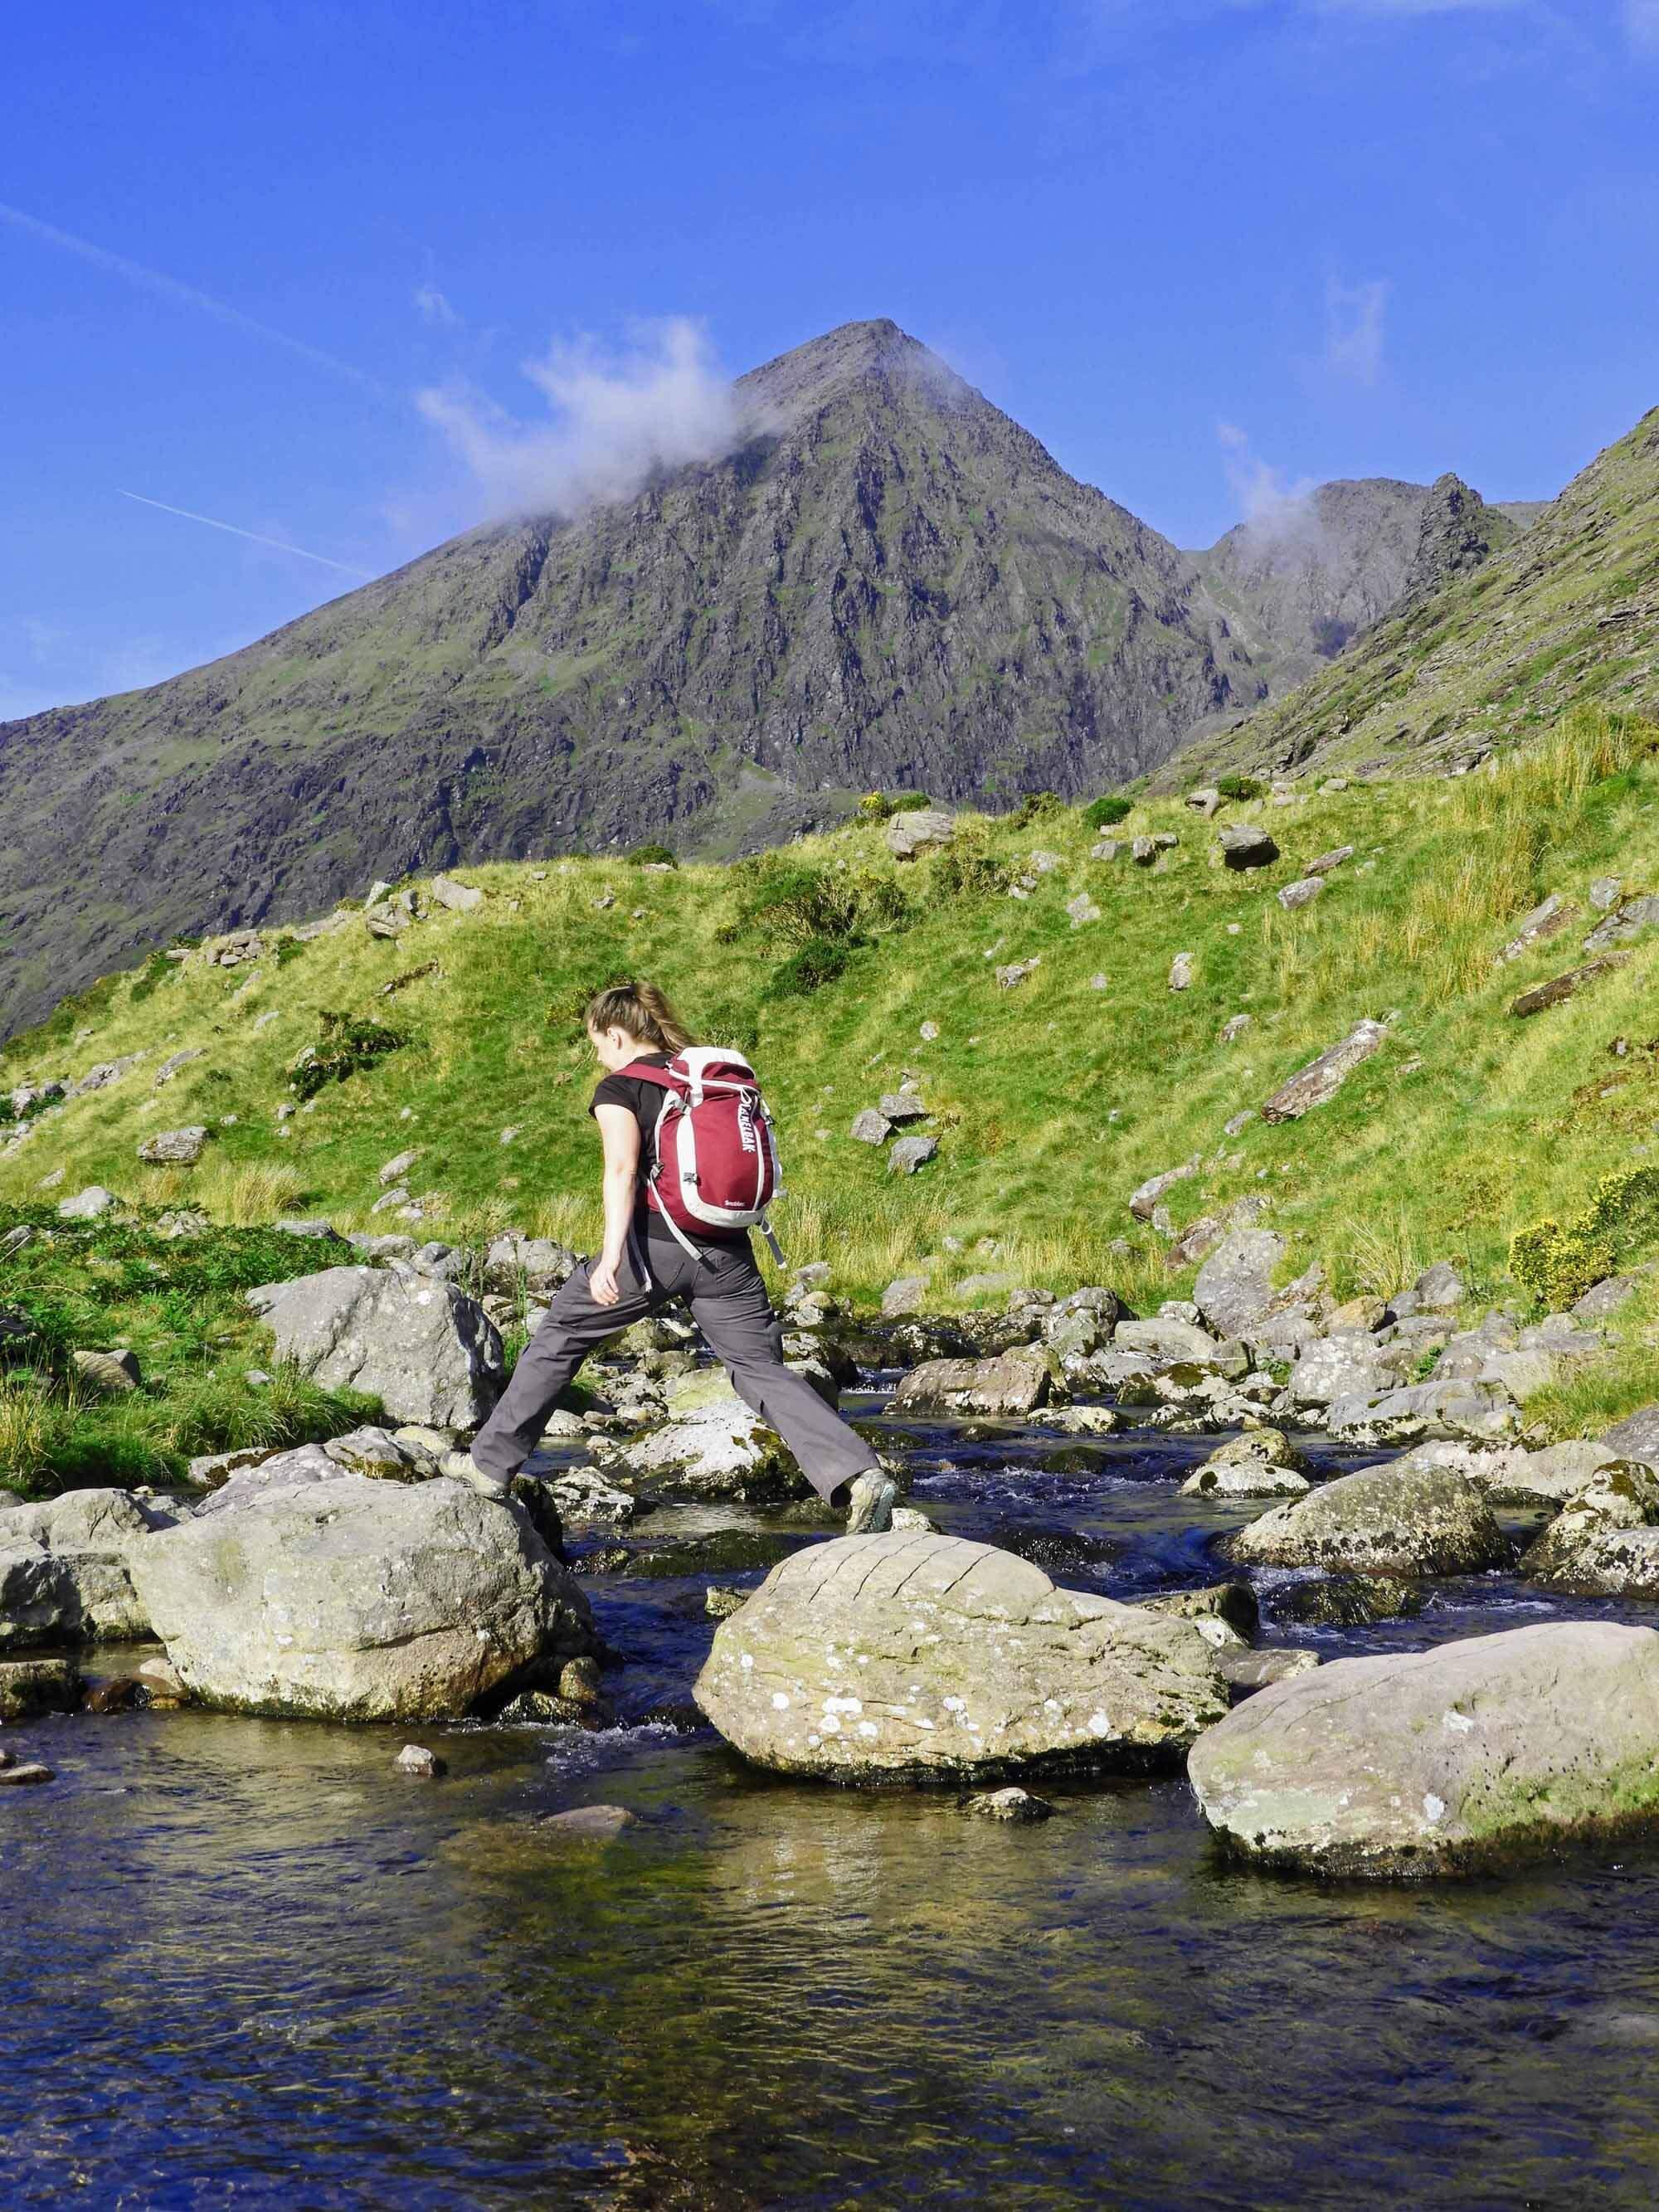 ireland-carrauntoohil-highest-mountain-peak-stream-crossing.jpg